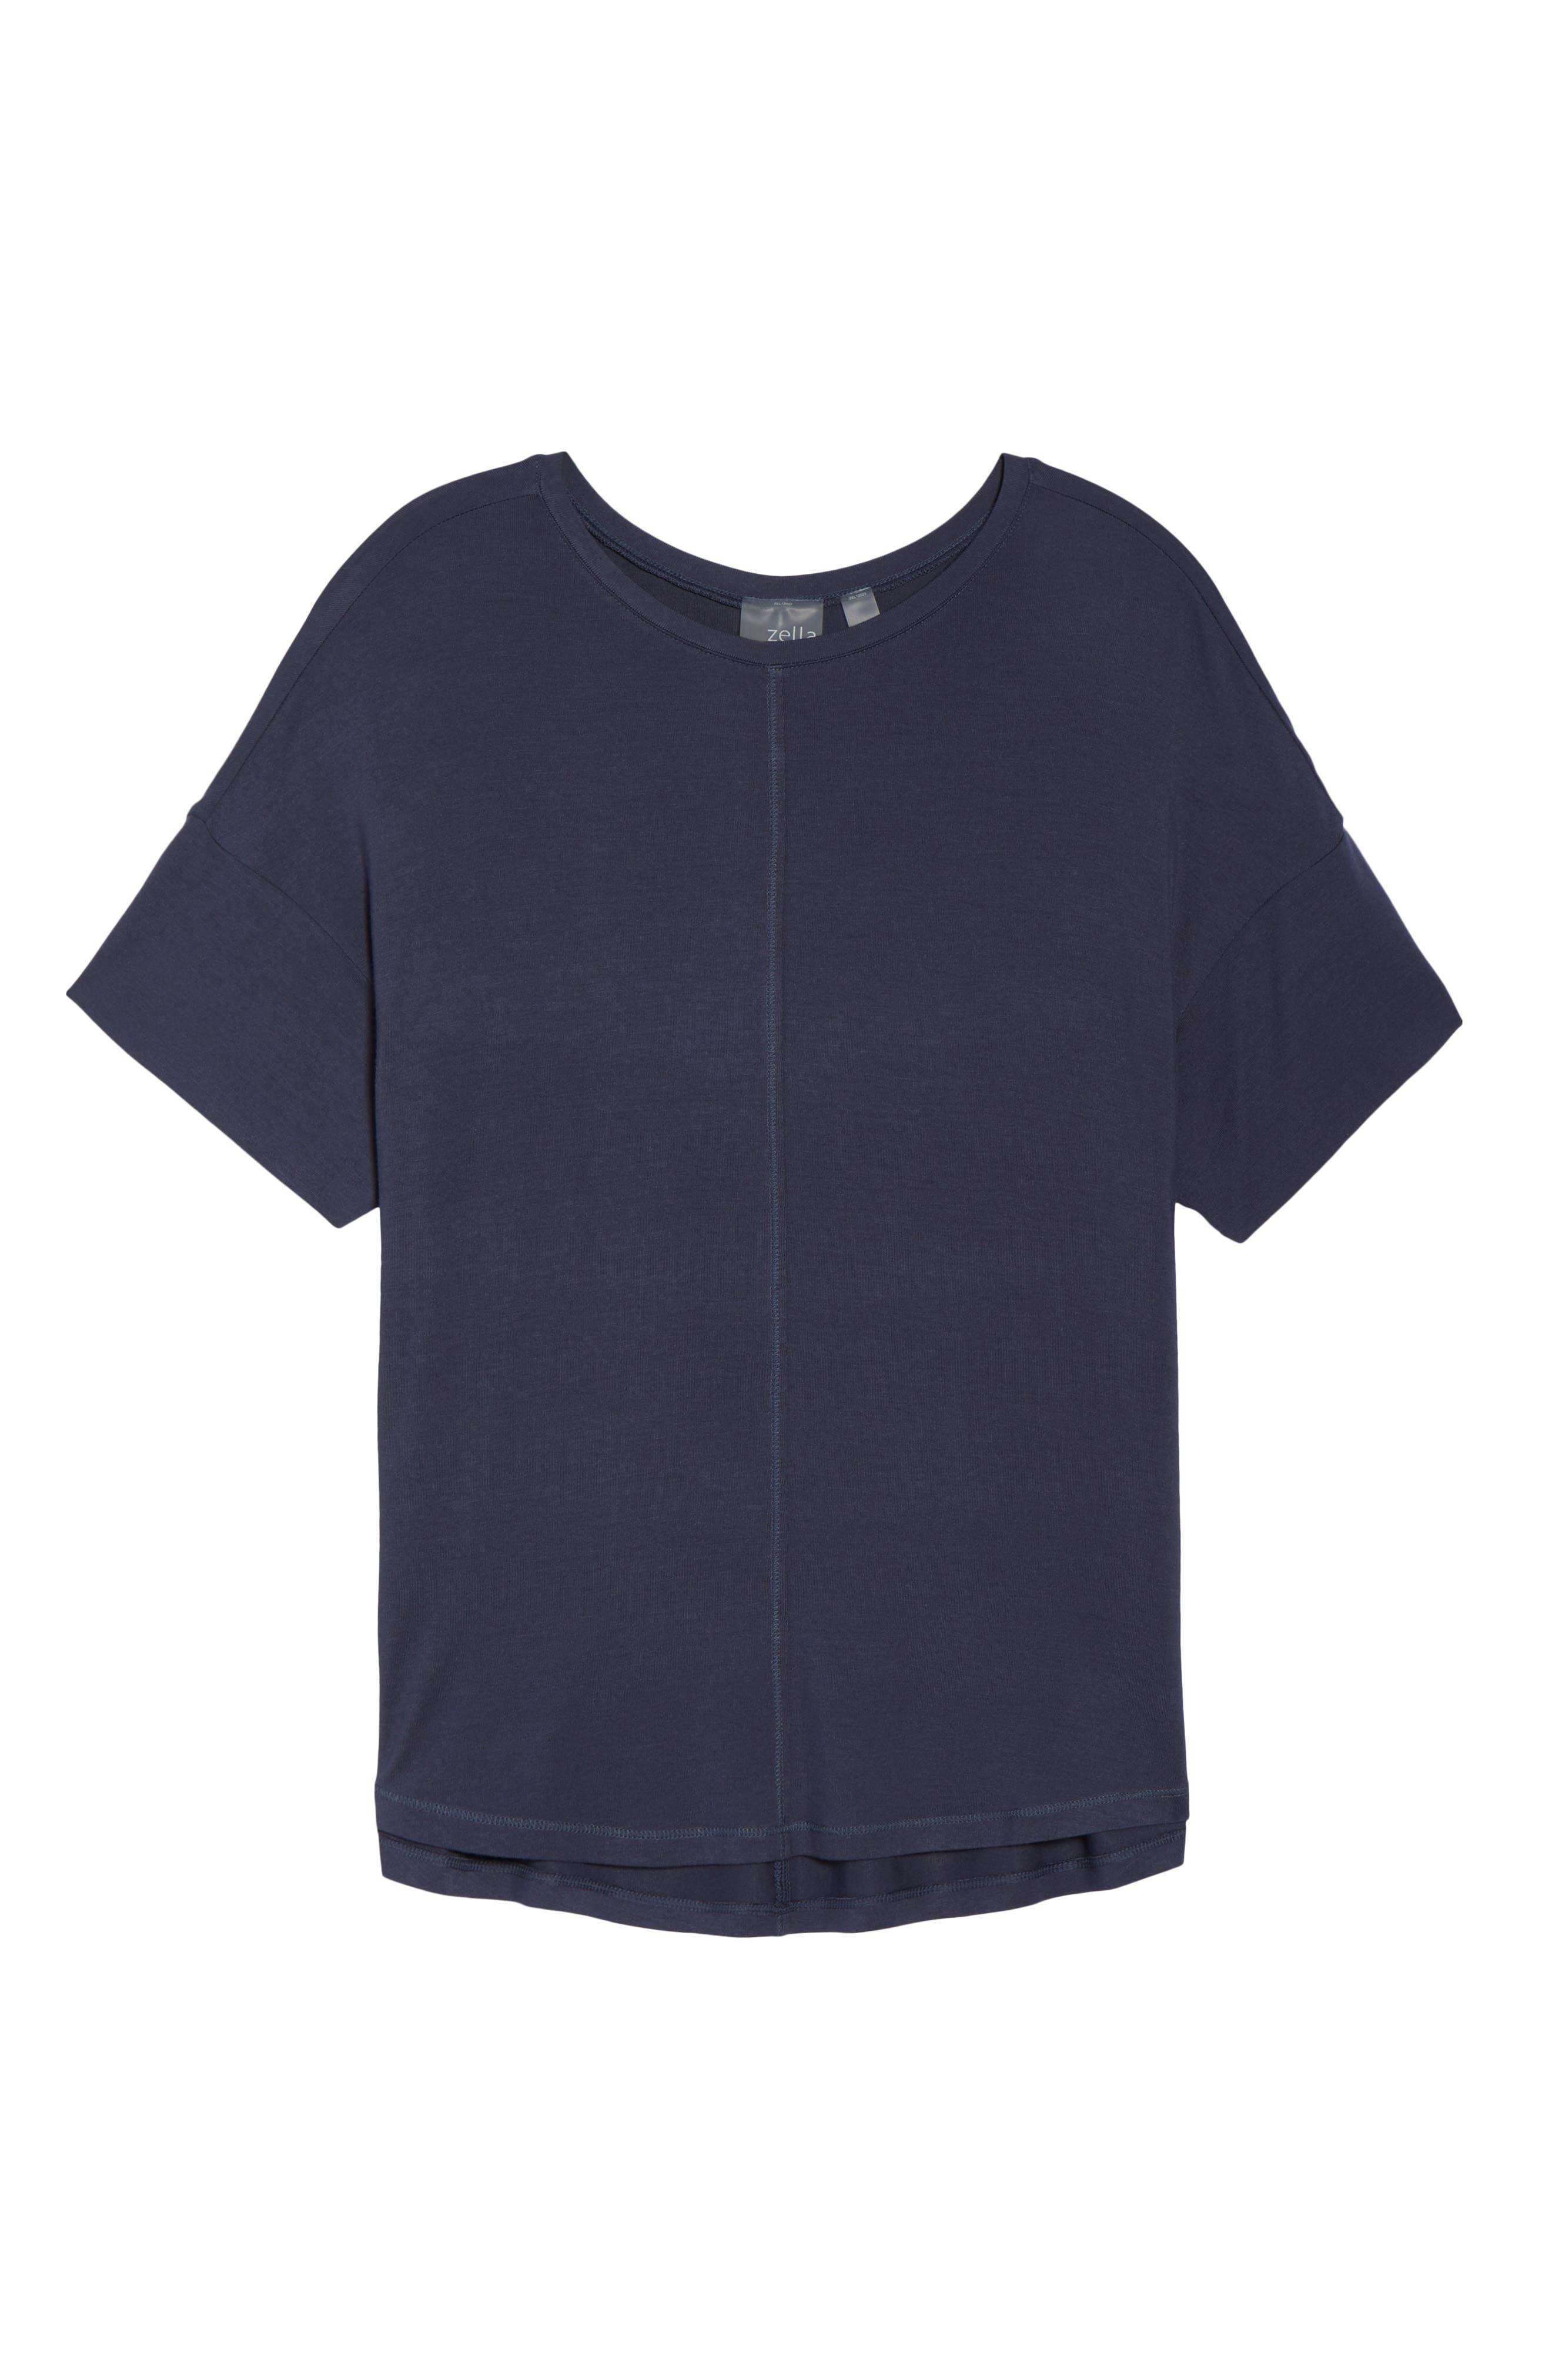 ZELLA,                             New Energy T-Shirt,                             Alternate thumbnail 7, color,                             GREY SLATE